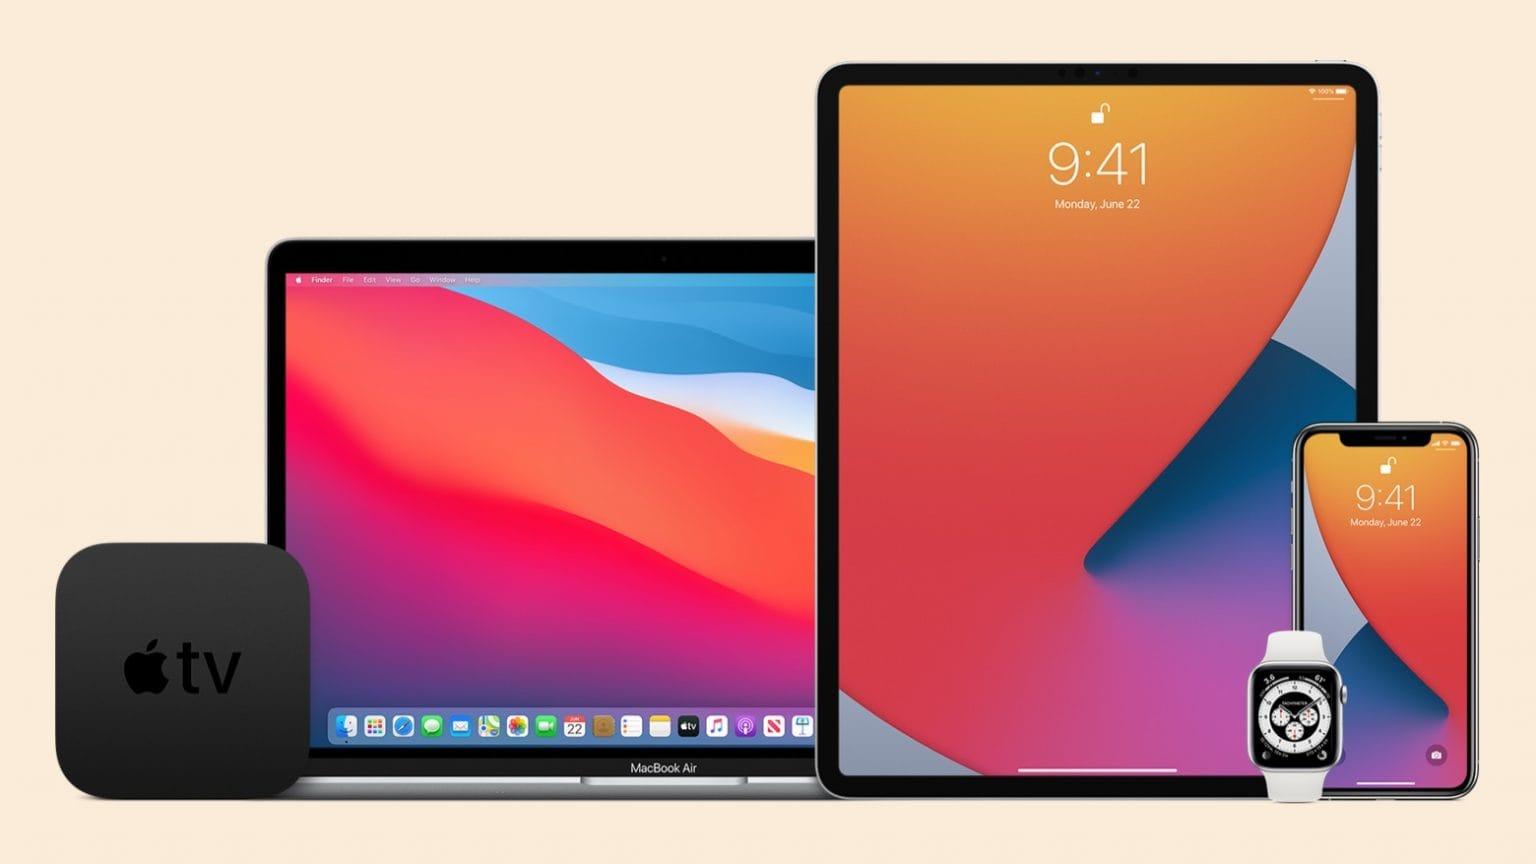 MacBook, iPad, Apple Watch, Apple TV